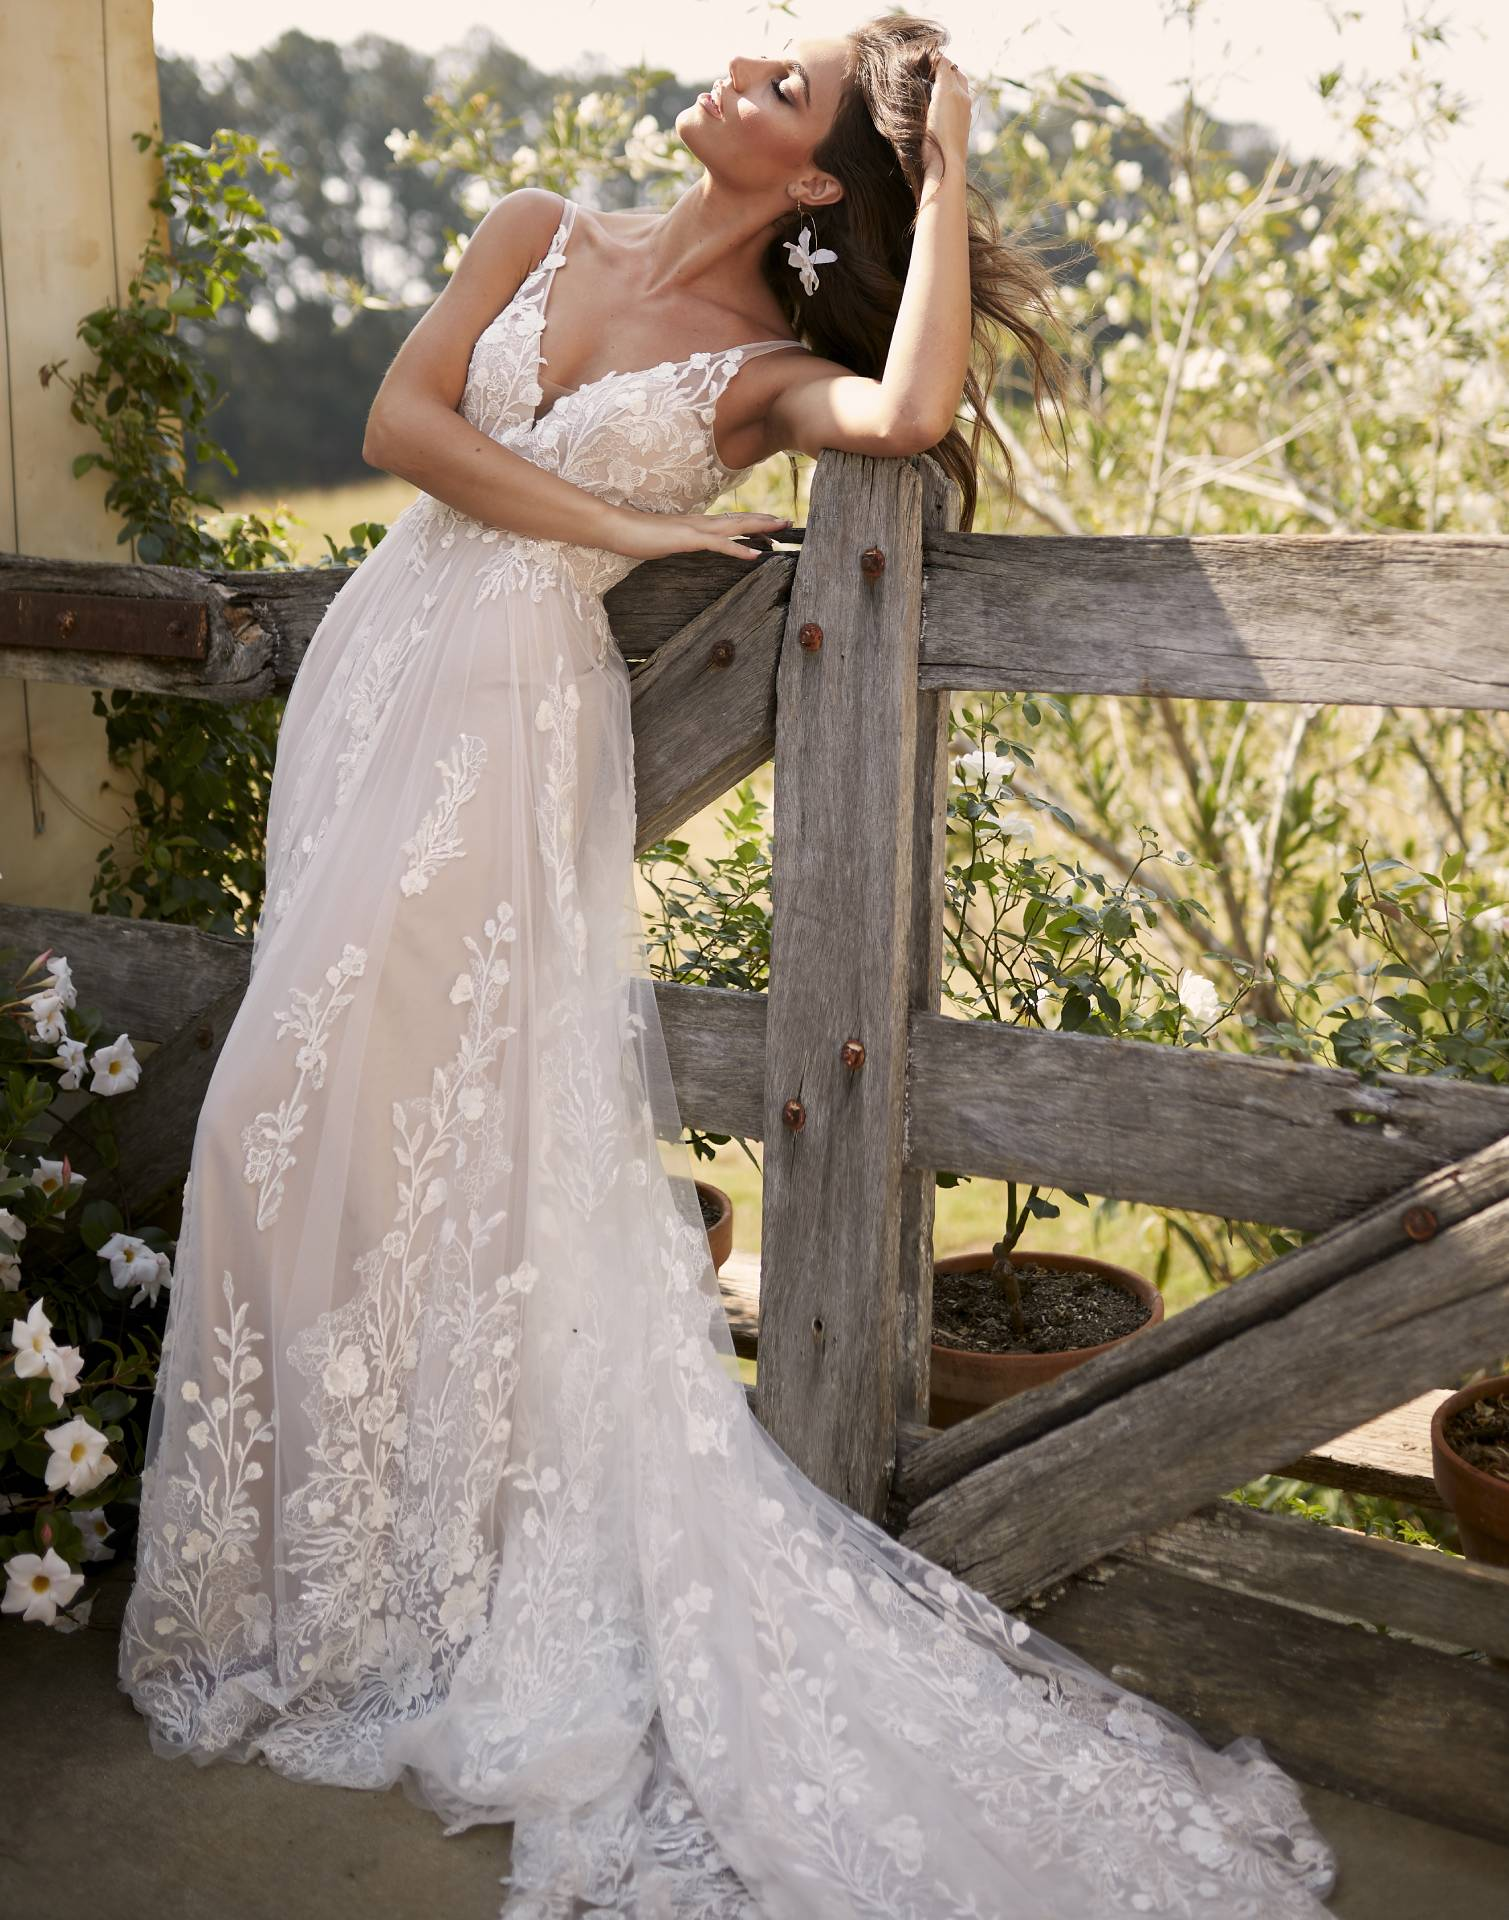 Harper_wedding_dress_Madi_Lane_collection_front_view-min